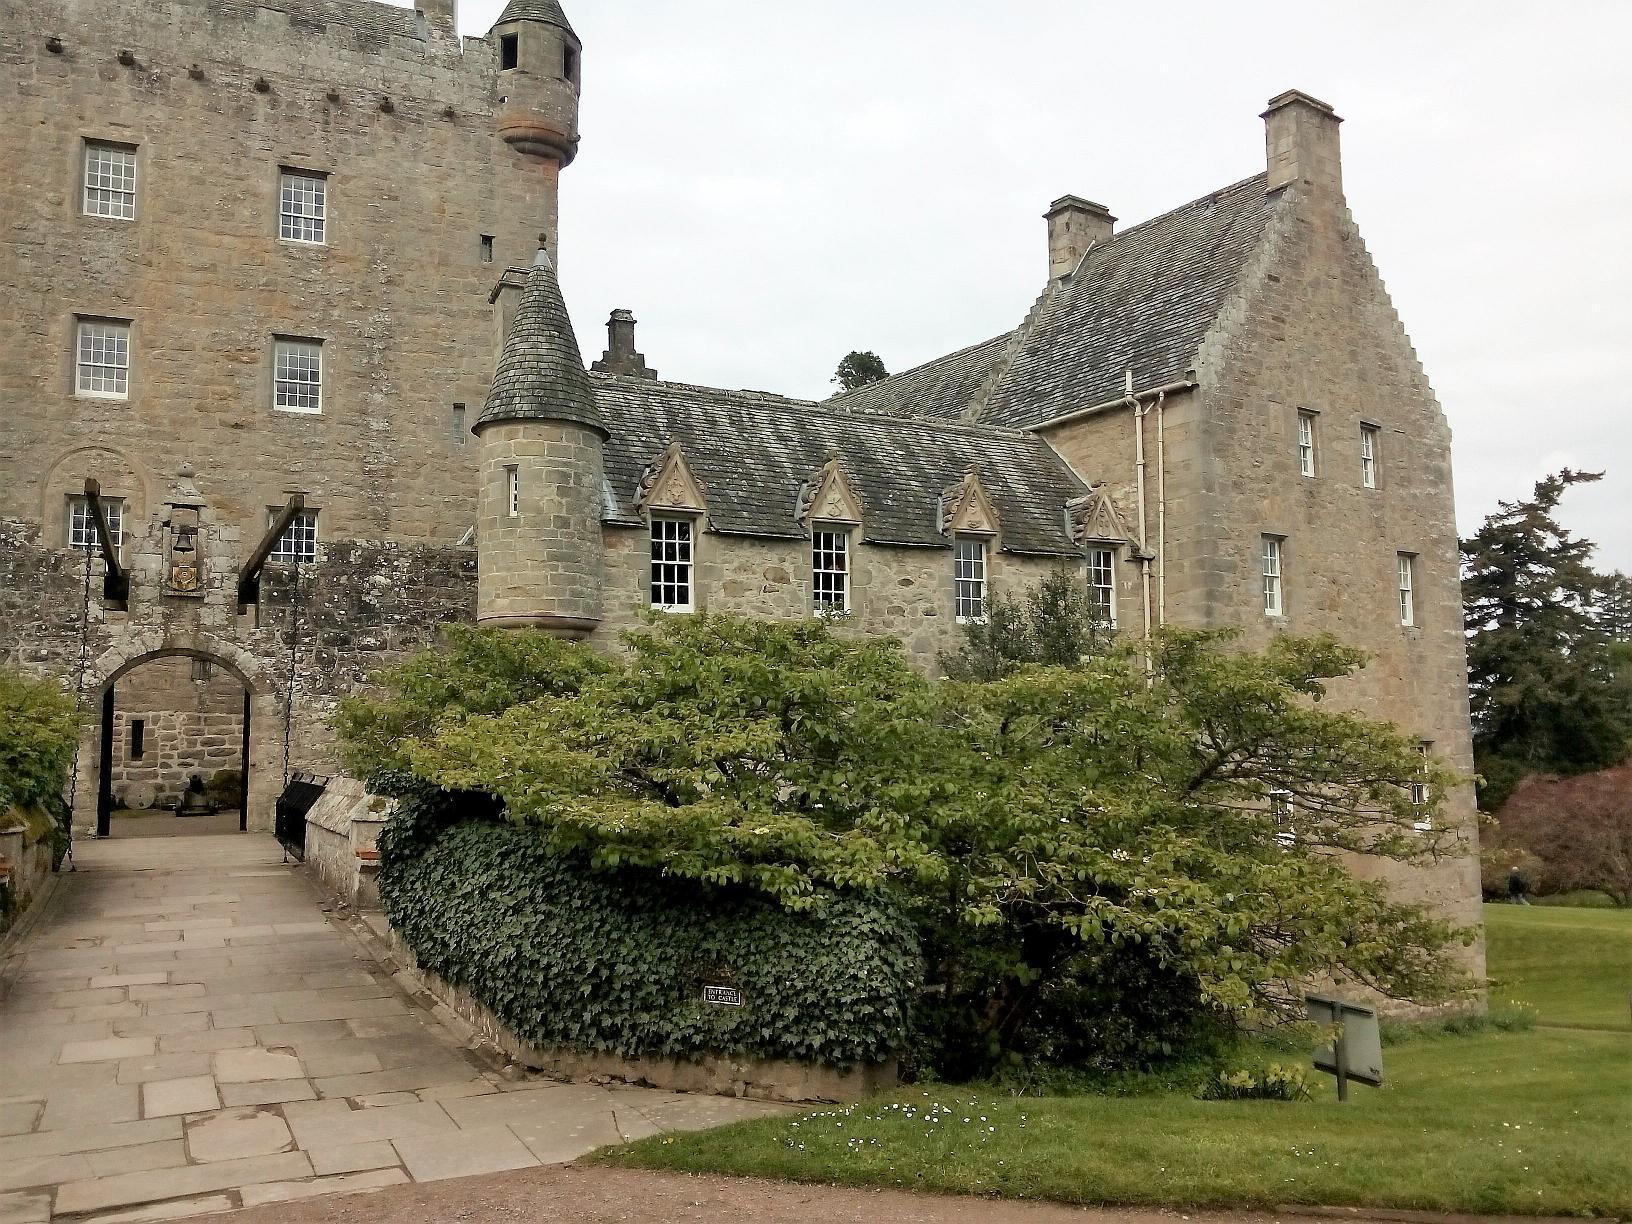 Cawdor Castle & Gärten